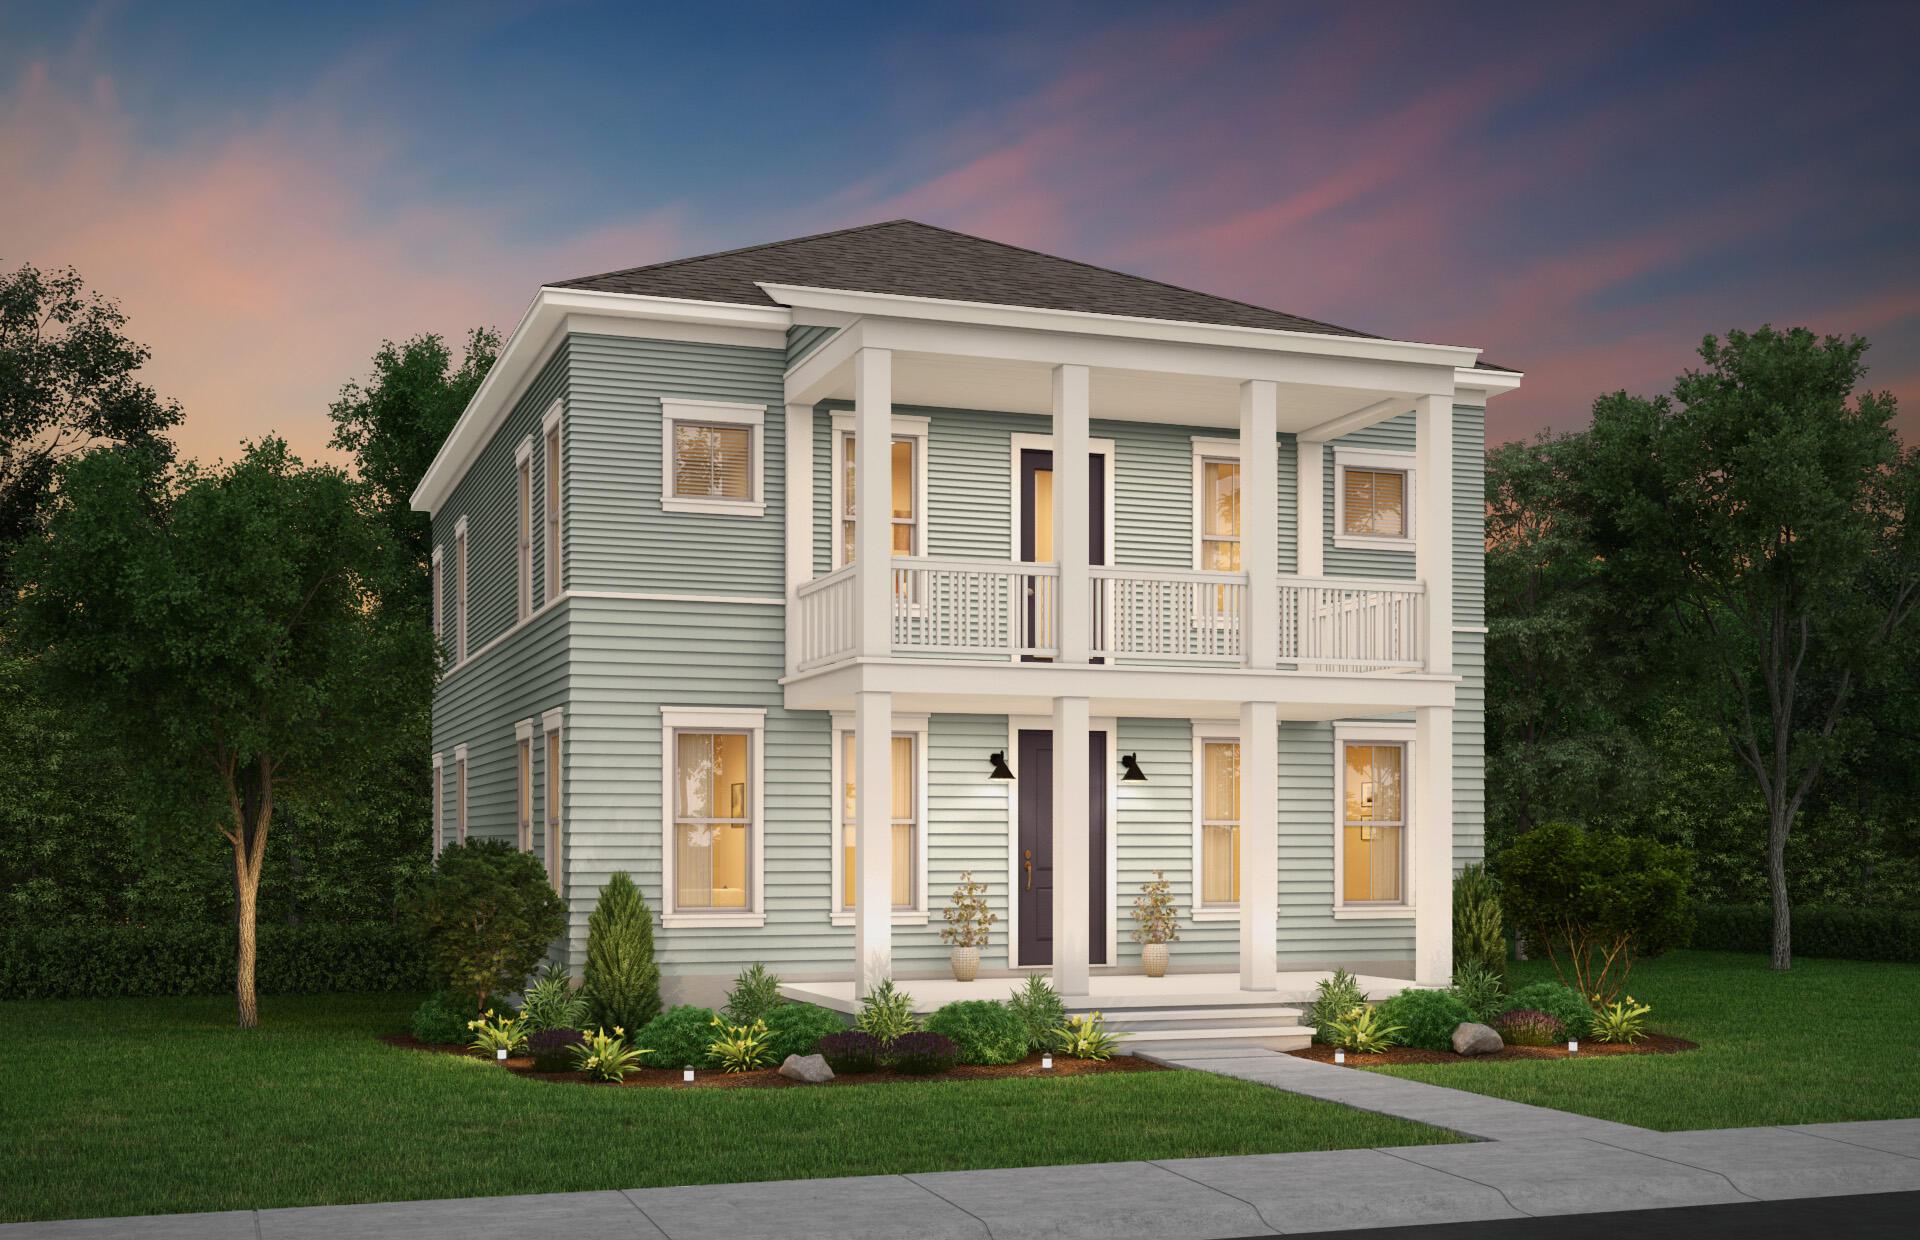 104 Integrity Lane, Charleston, 29492, 4 Bedrooms Bedrooms, ,3 BathroomsBathrooms,For Sale,Integrity,21011635